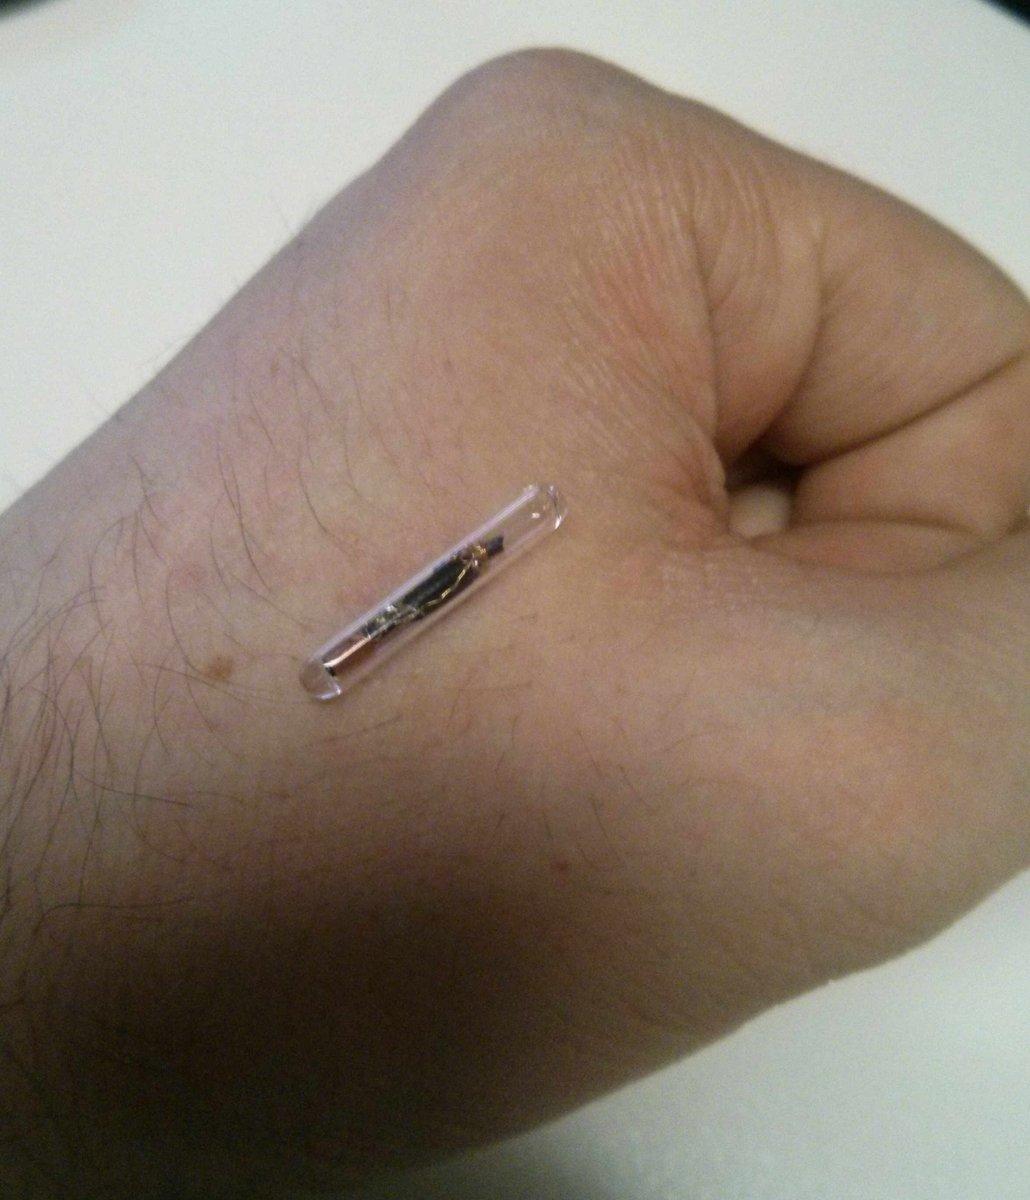 BirdMachine At 3x17mm It Is Big But Still Safe To Implant Whats Nextpictwitter PJSVCFdnRx